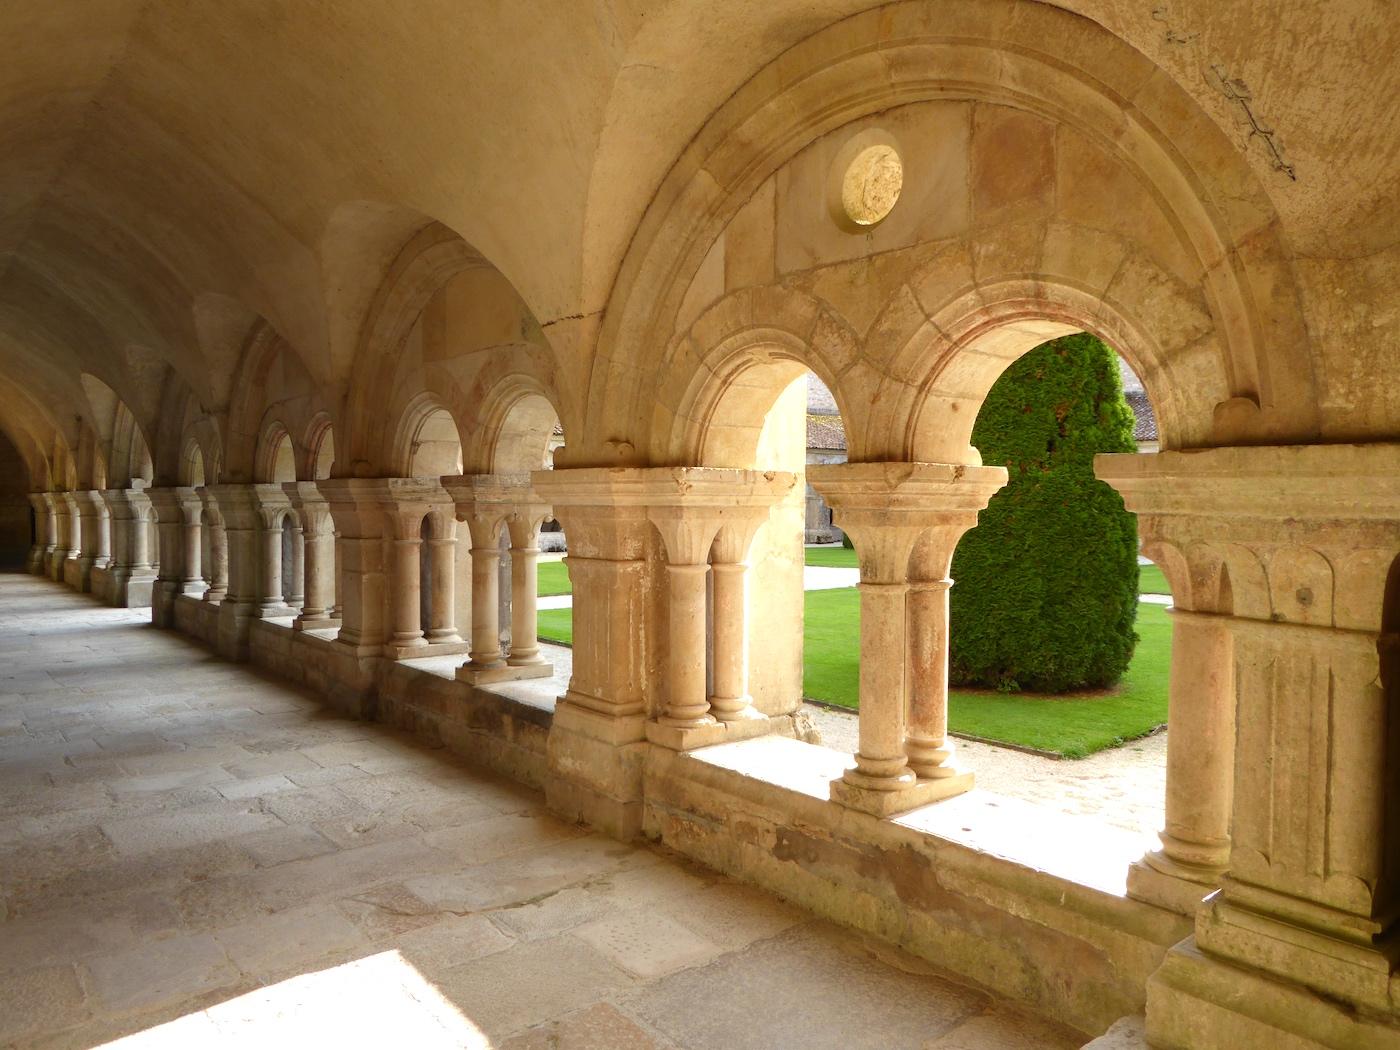 L'abbaye de Fontenay, visite en Côte-d'Or